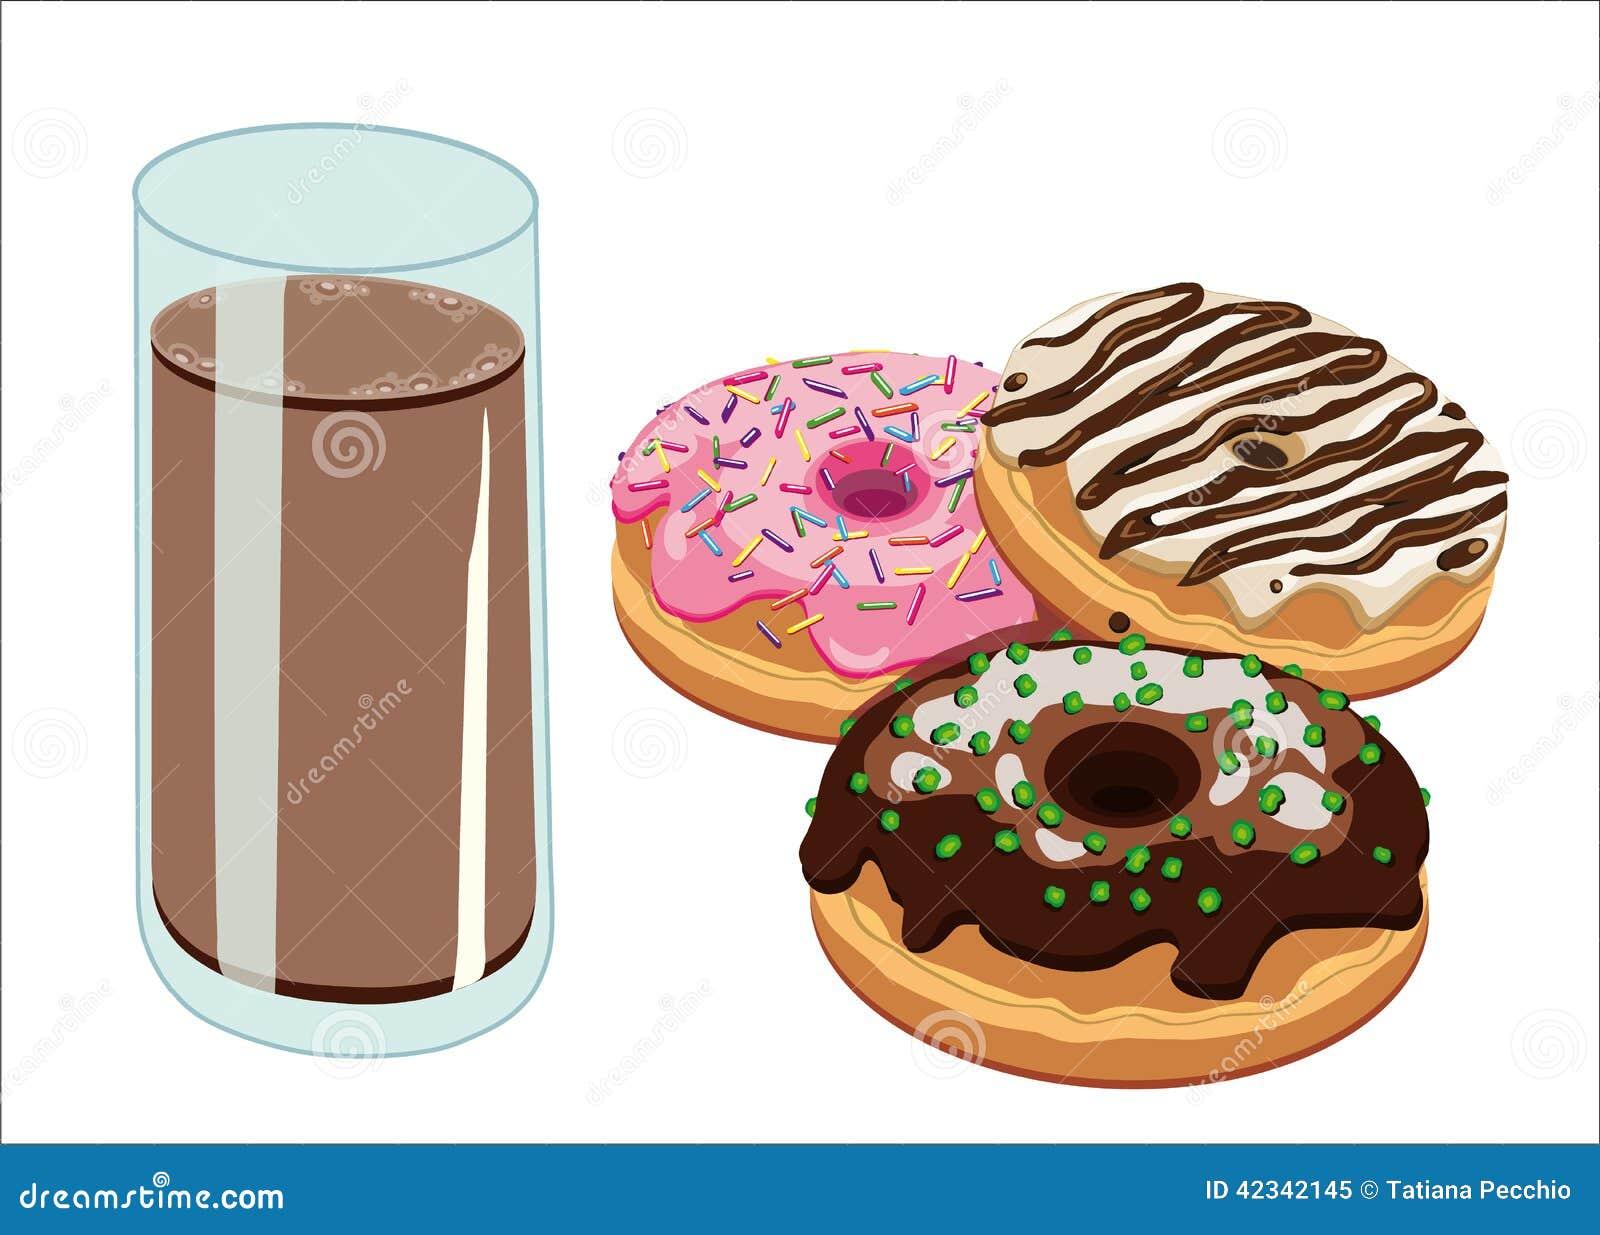 Chocolate Milk And Cartoons